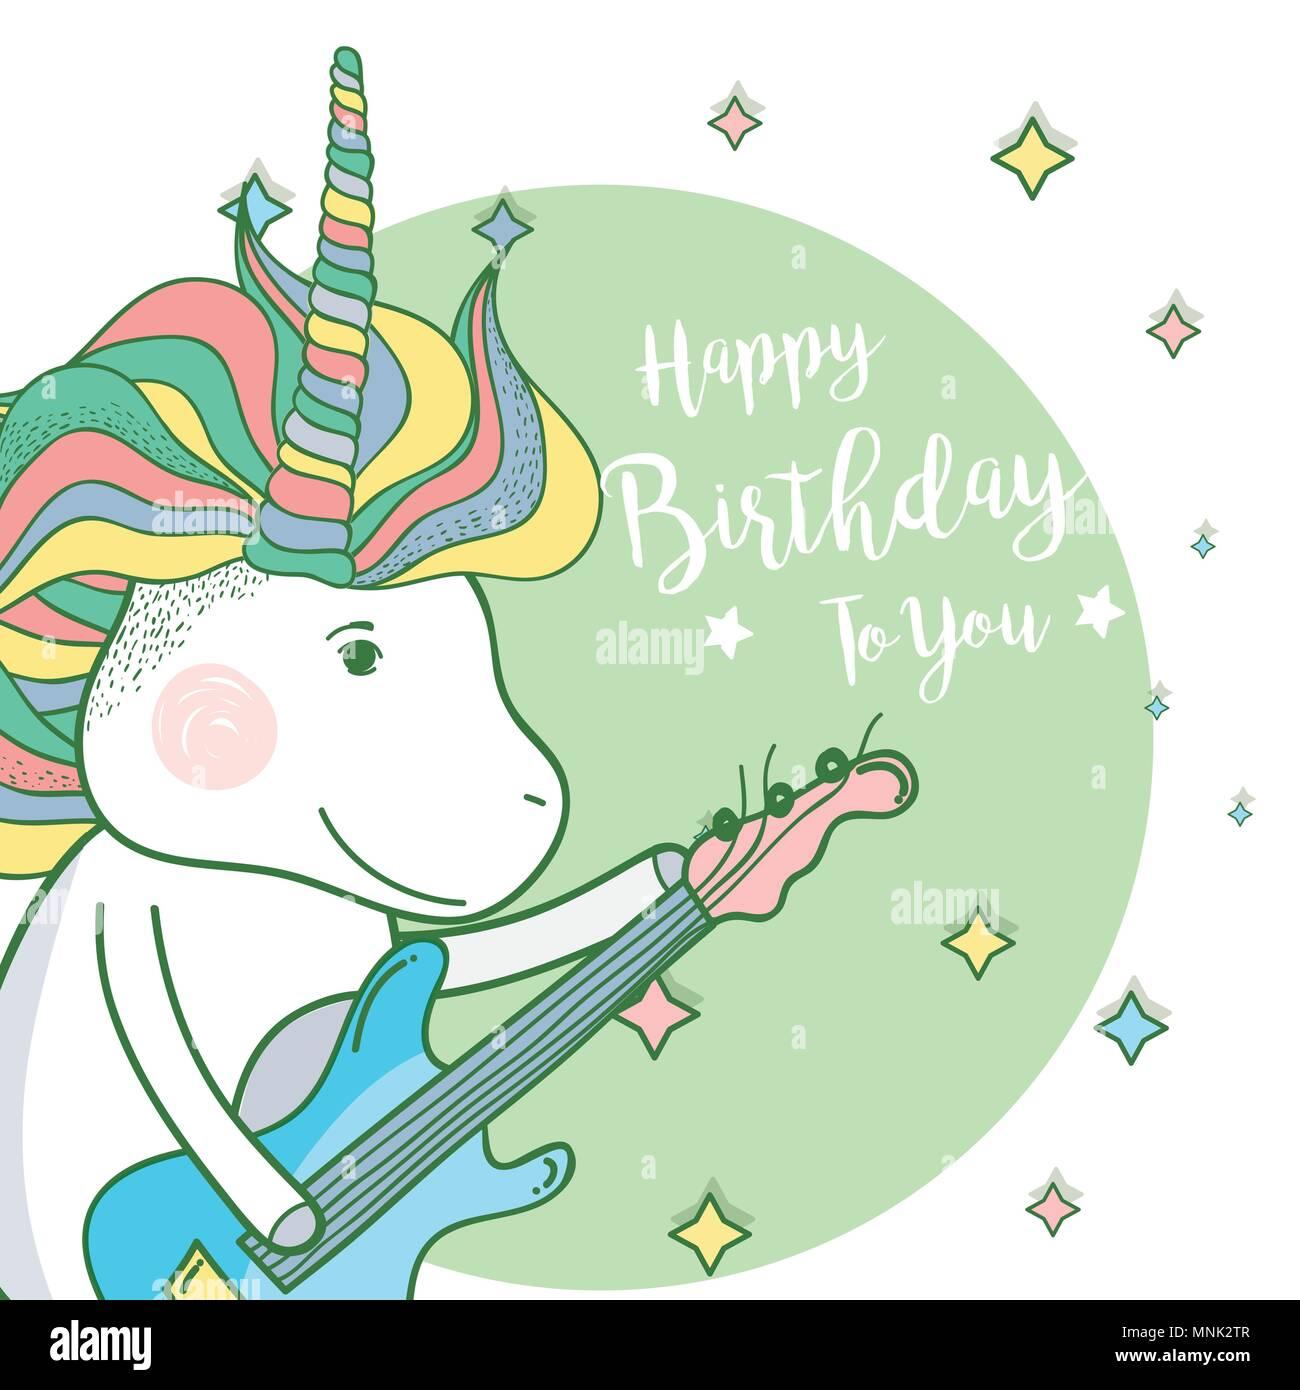 Happy Birthday Card Stock Vector Art Illustration Vector Image